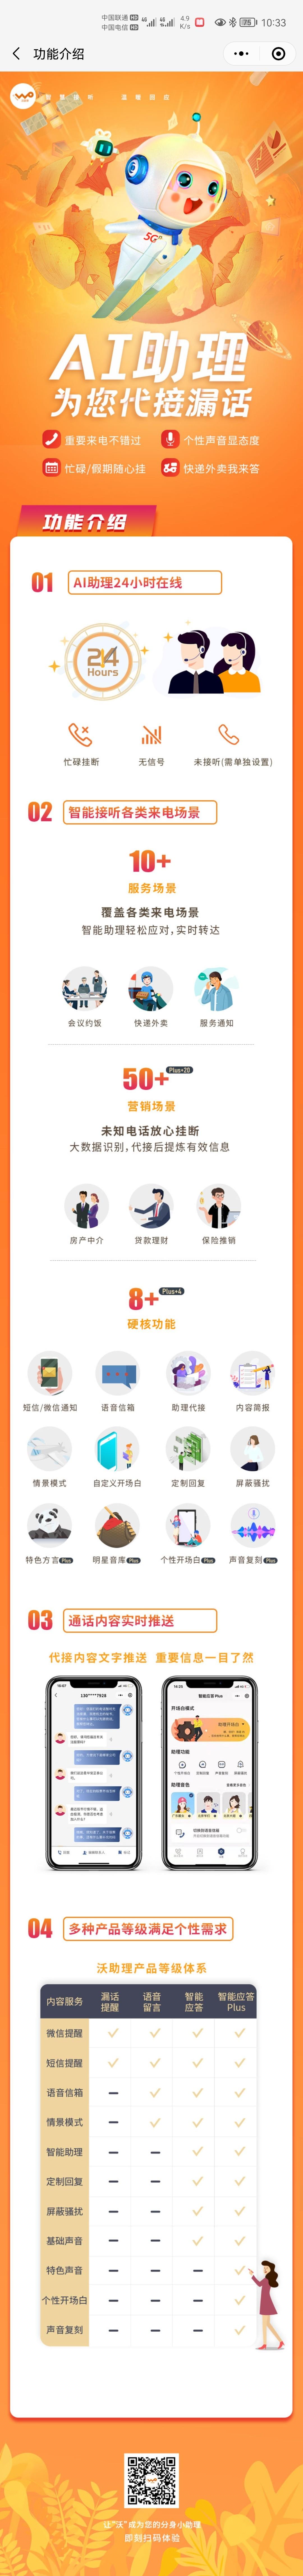 Screenshot_20210820_223321_com.tencent.mm.jpg